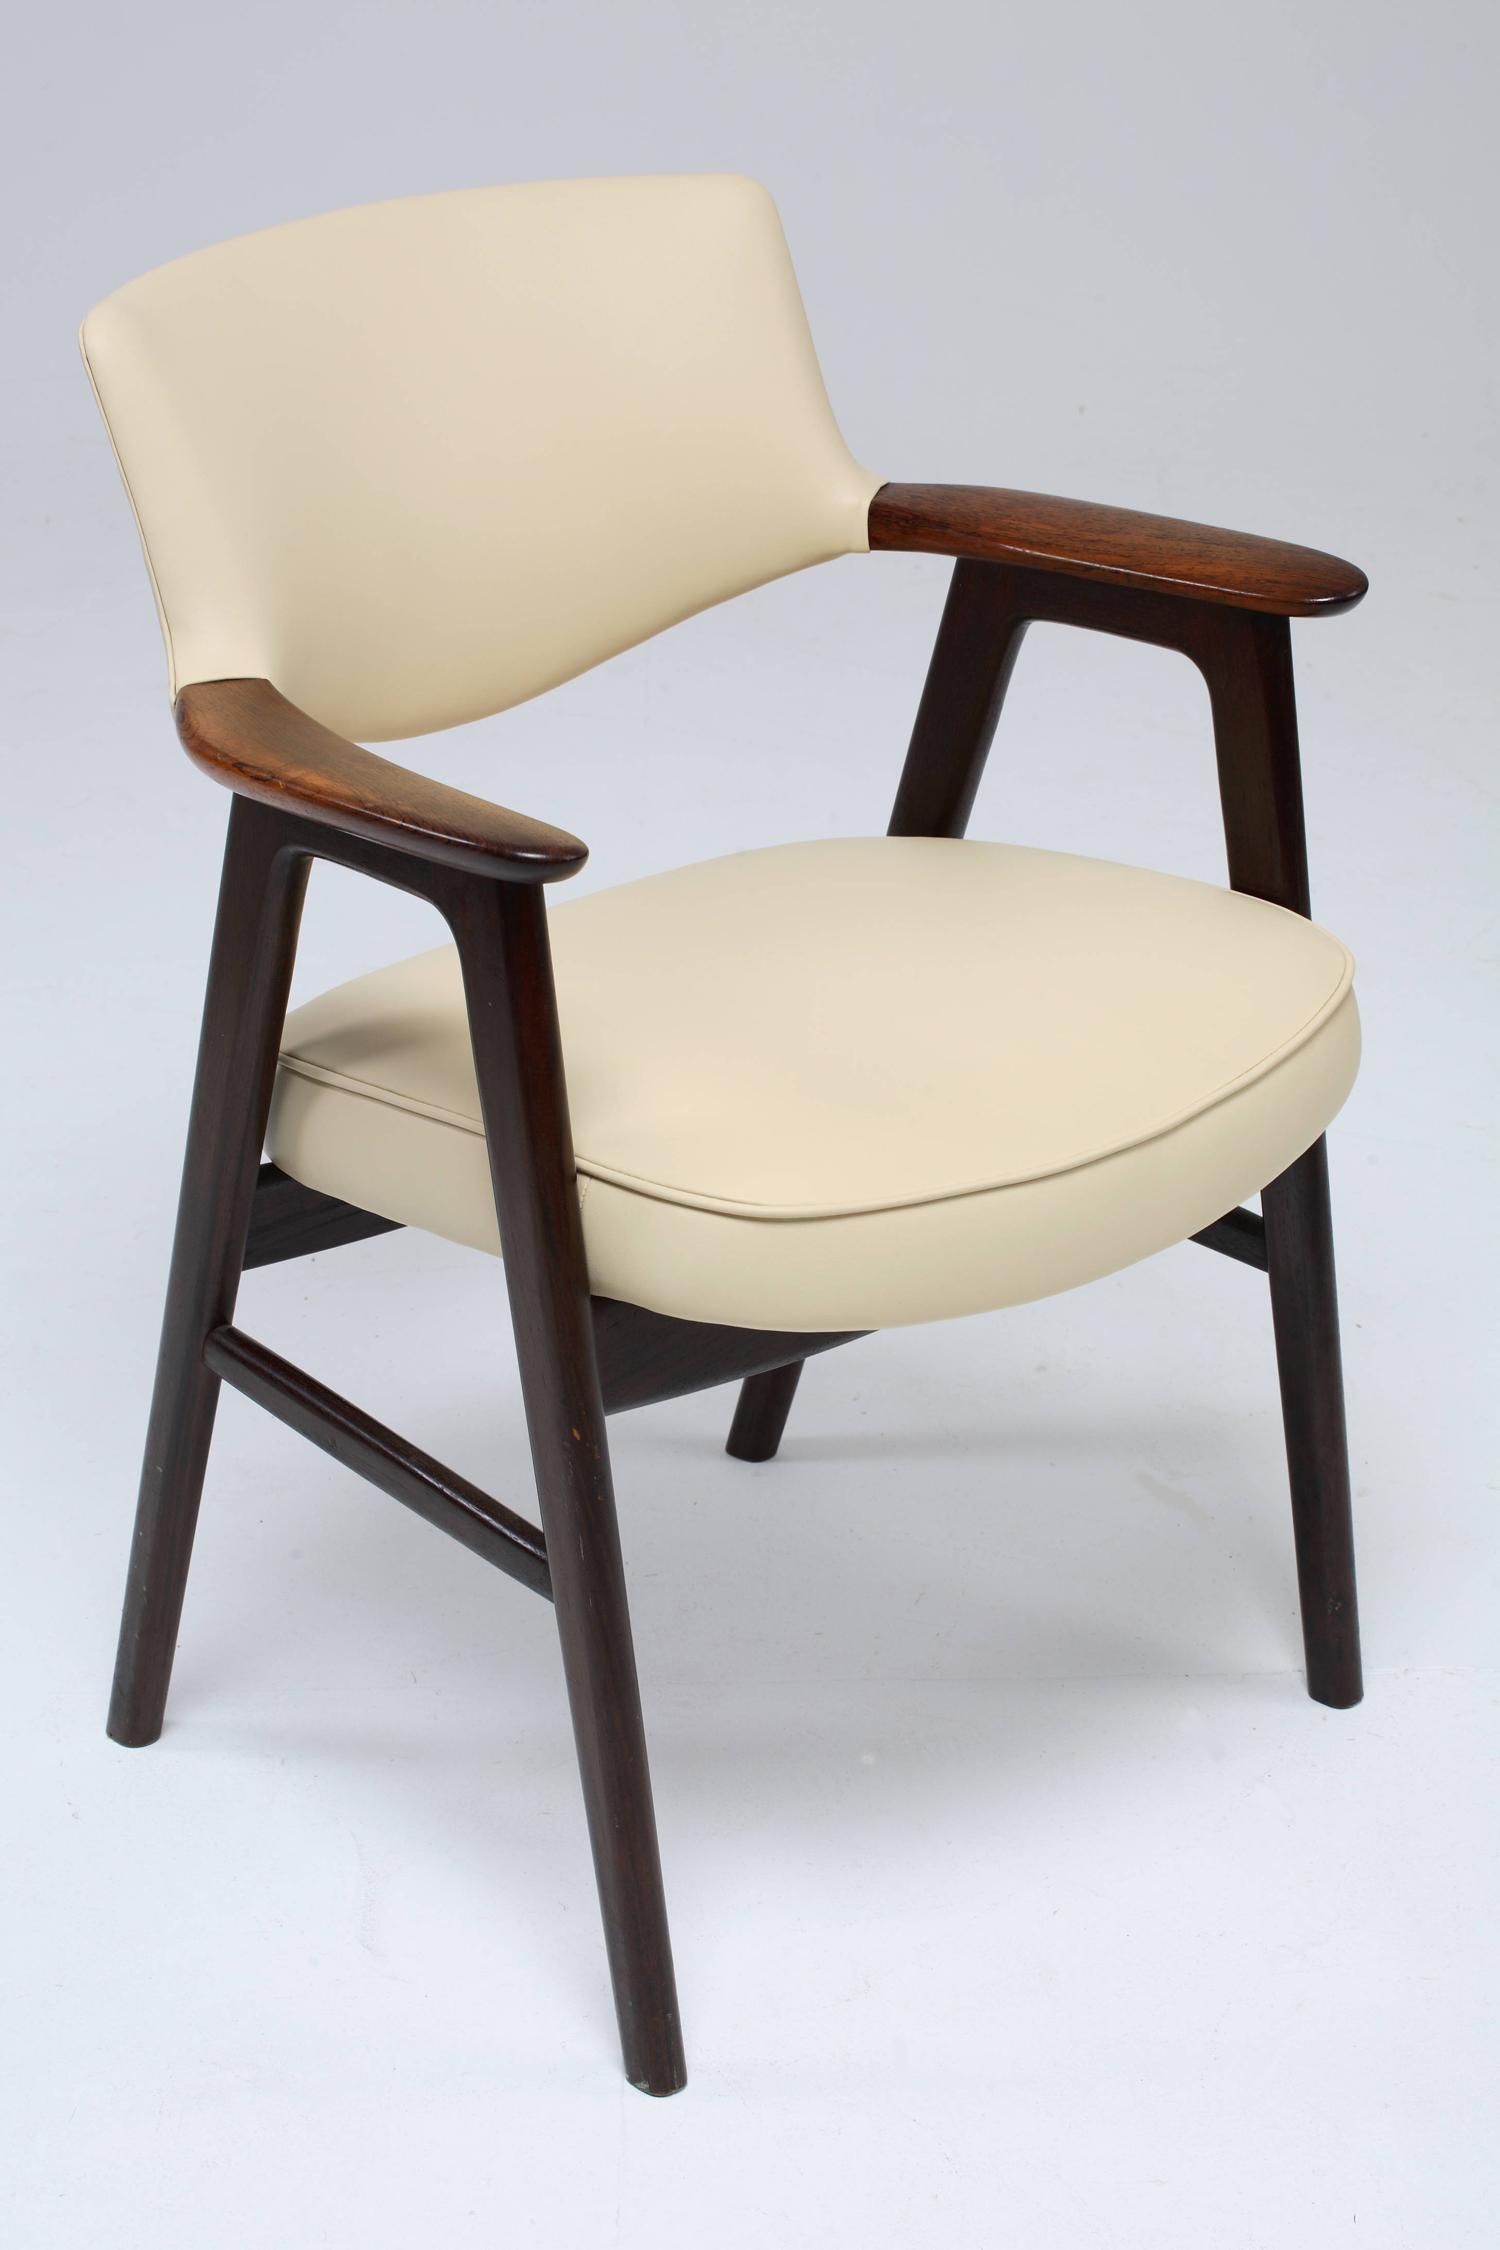 Chair_7_002_resize.jpg